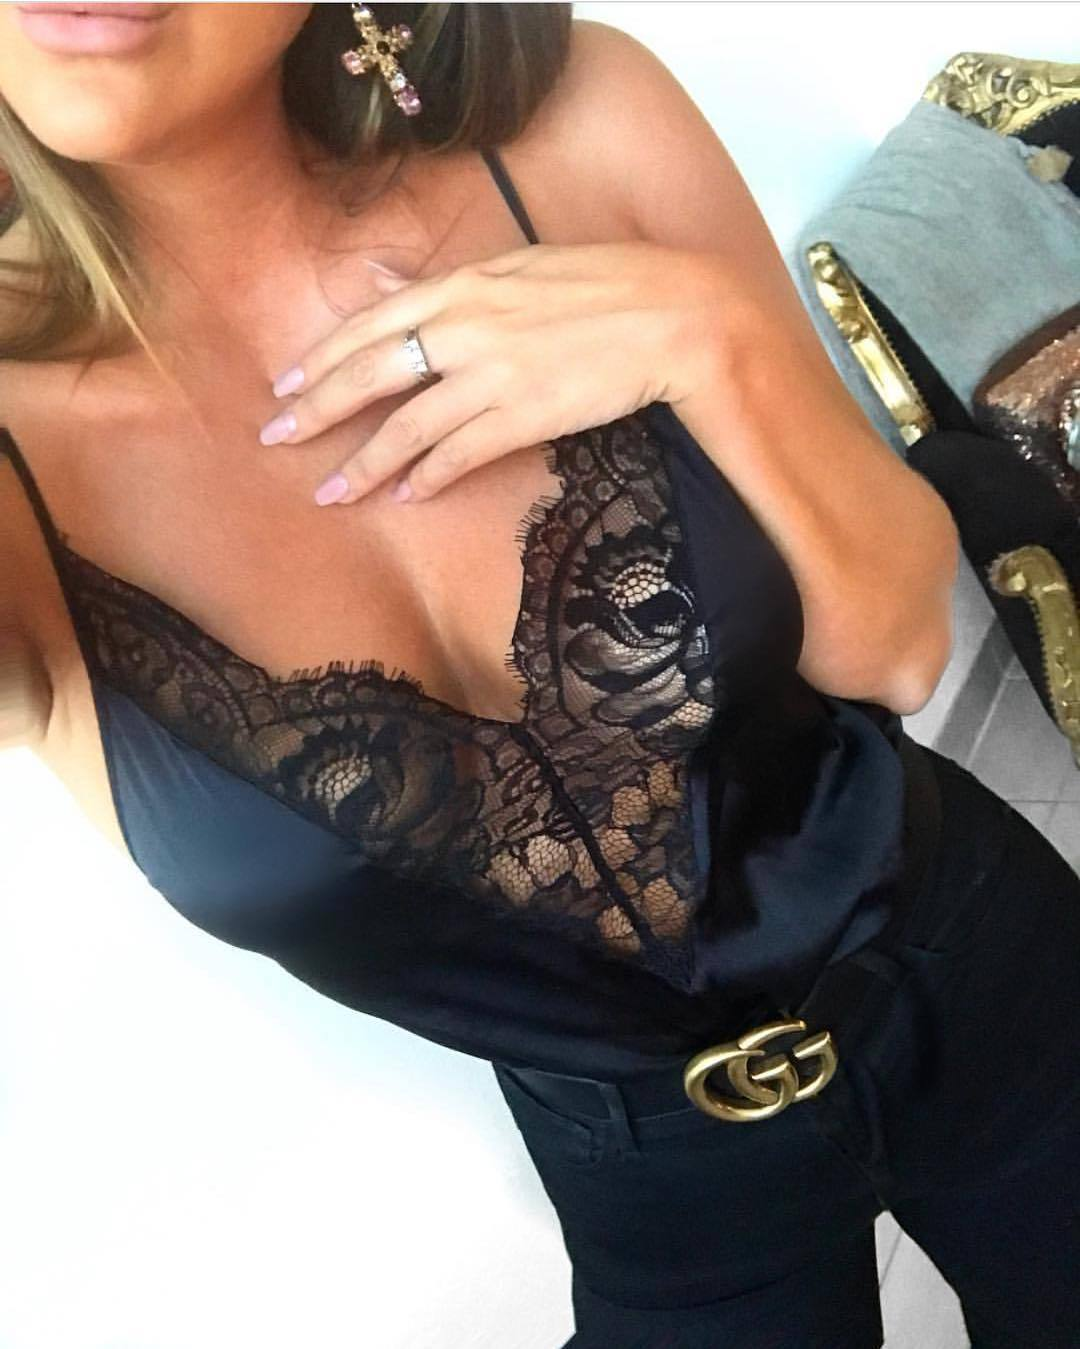 95fe2ca6527f HIRIGIN Newest Hot Women Sexy Spaghetti Strap Lace Stain Vest Tops Tanks  Camisole Underwear New-in Camisoles   Tanks from Underwear   Sleepwears on  ...